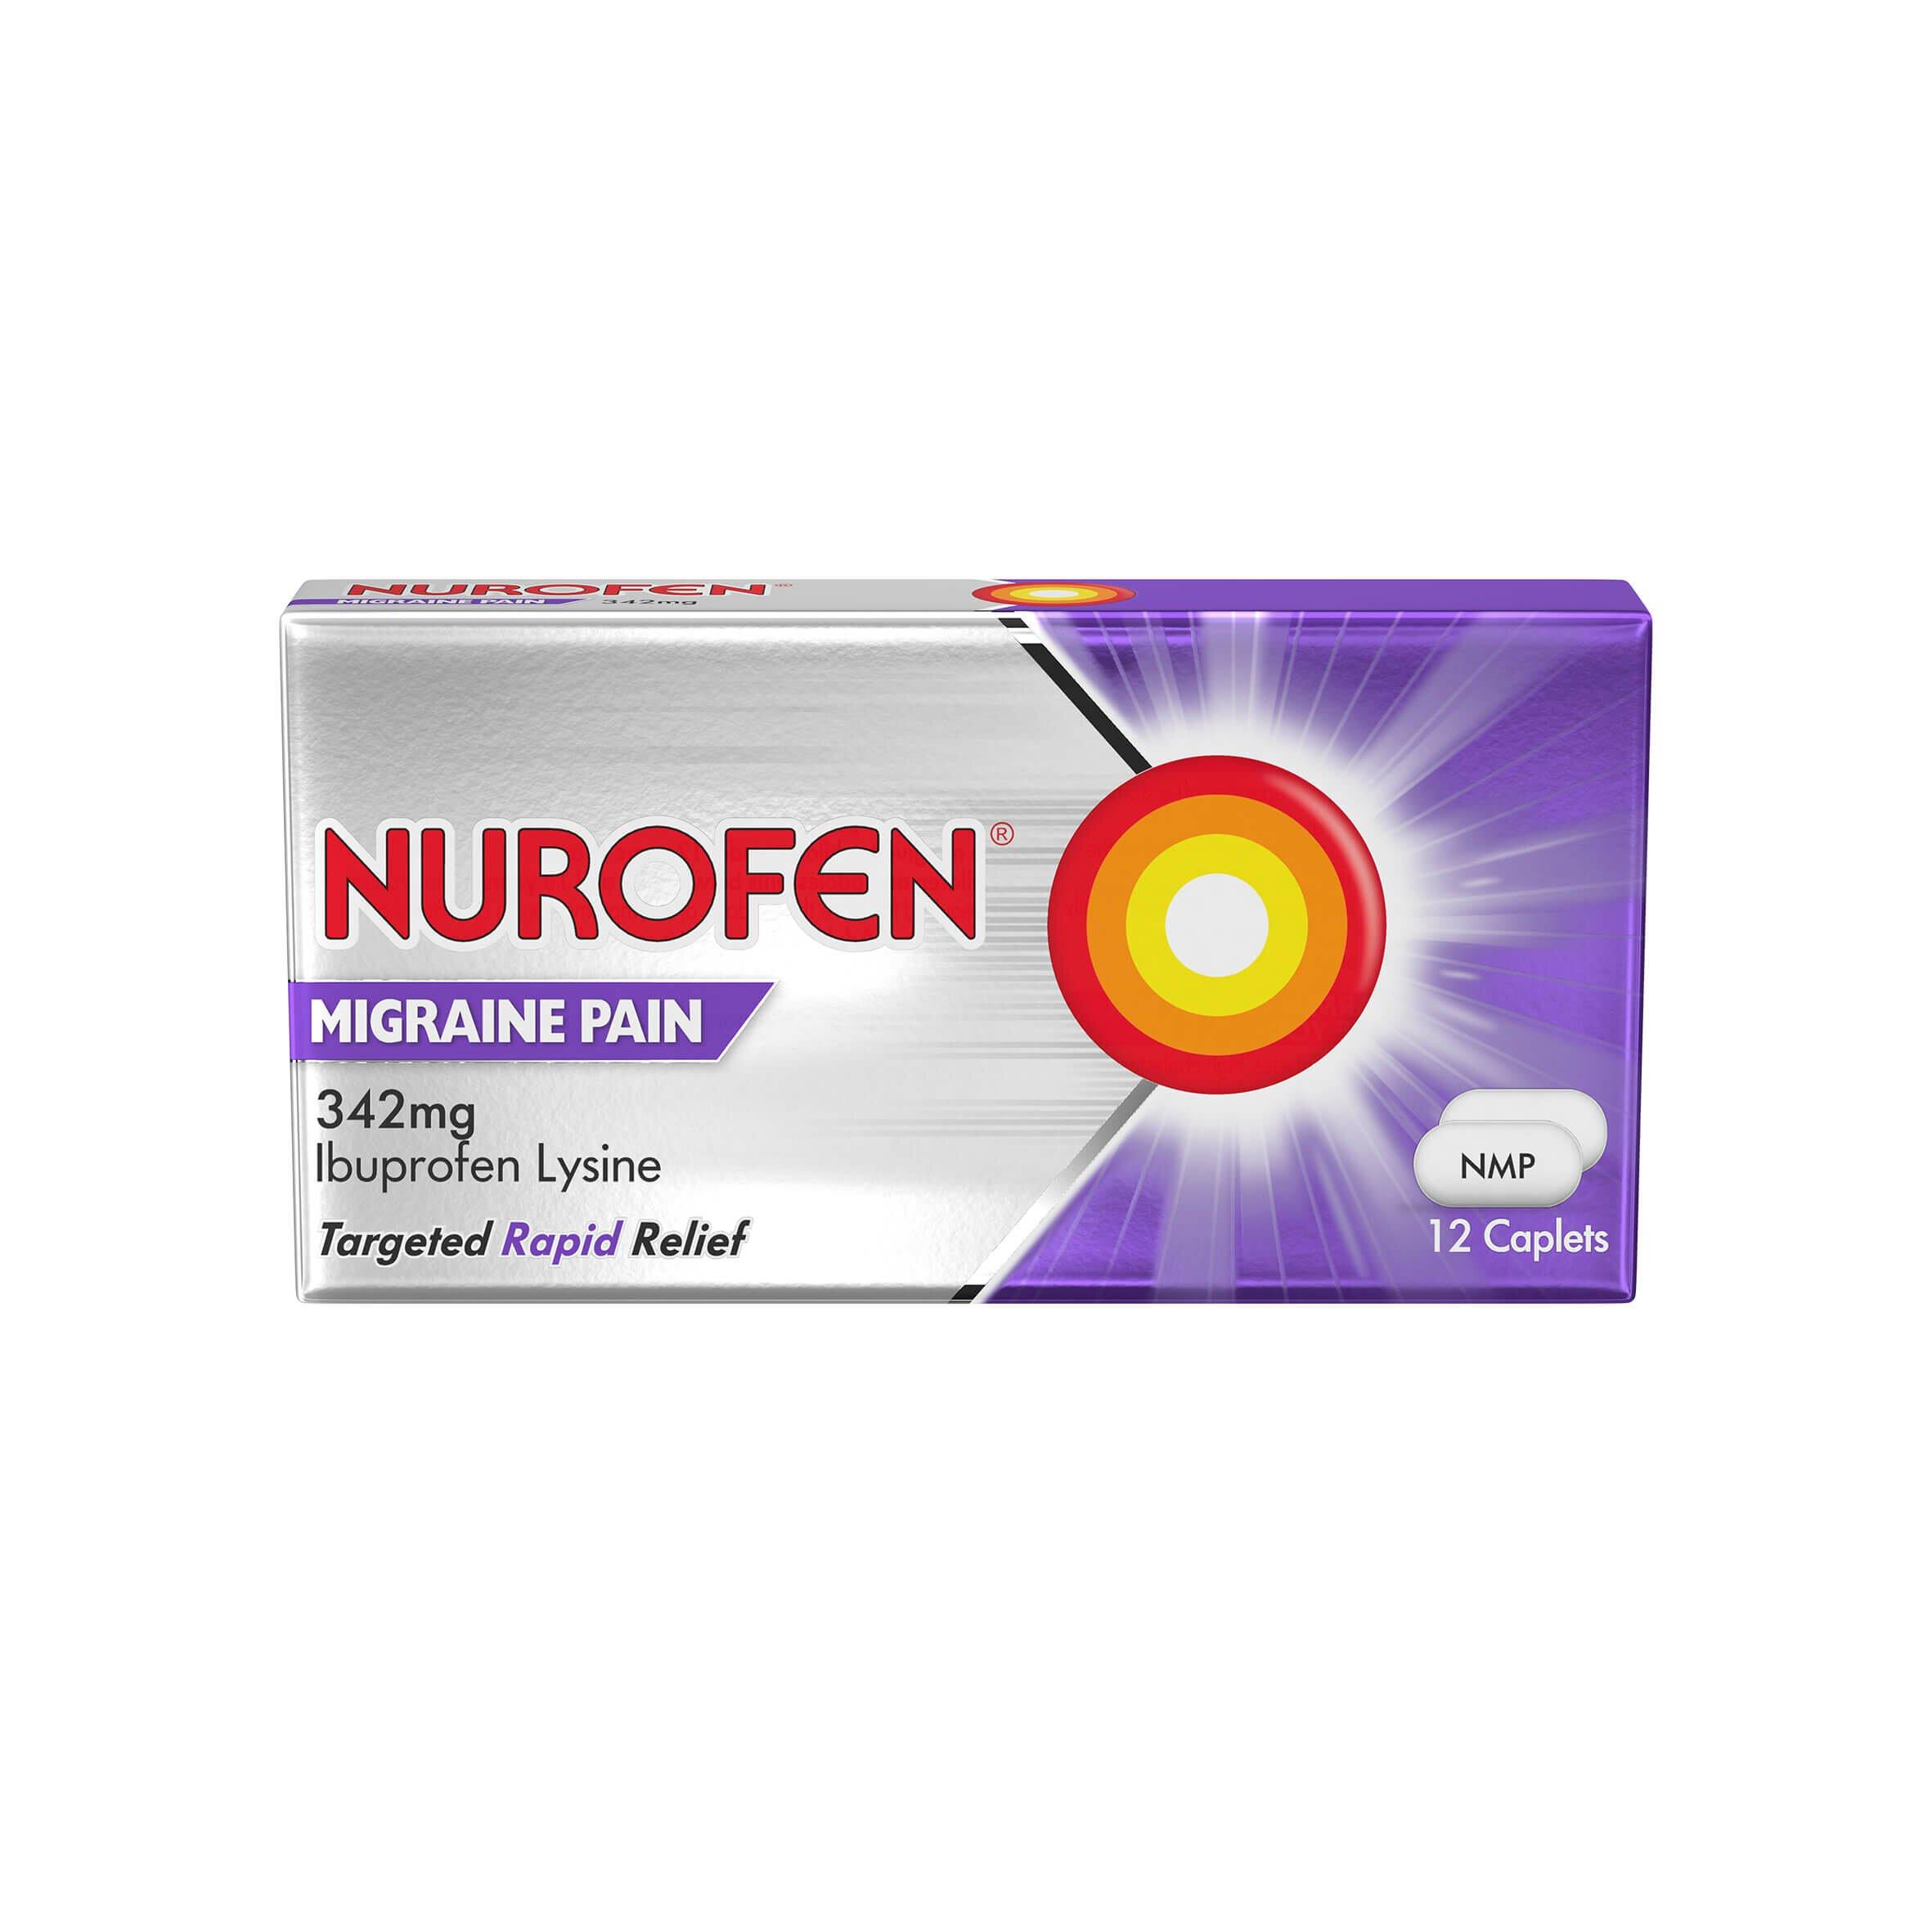 Nurofen Migraine Pain Tablets Pack of 12